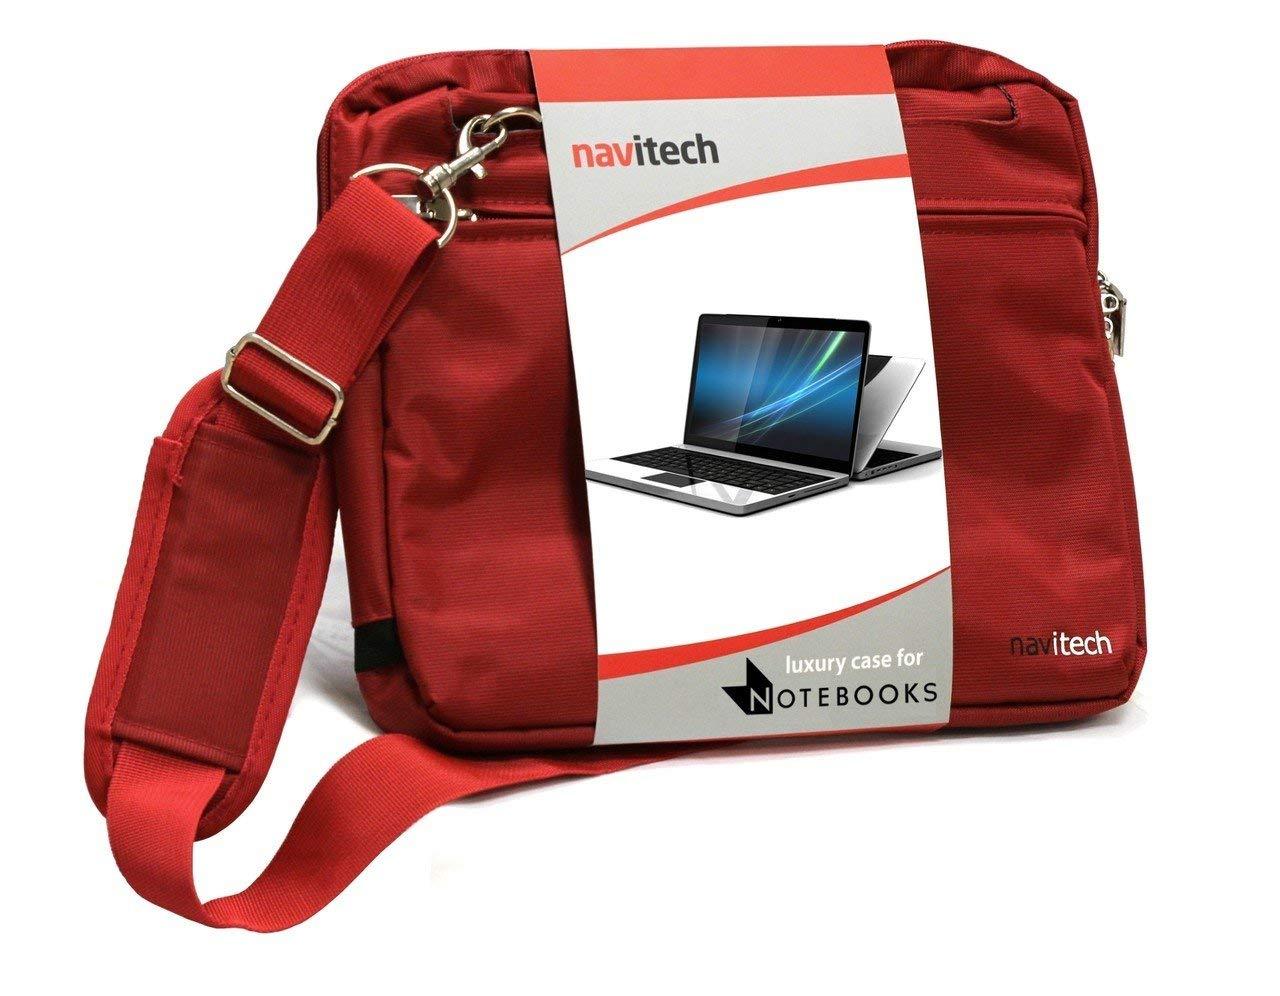 Navitech レッド スリーク プレミアム 防水 衝撃吸収 キャリーバッグ ケース ASUS Vivobook S15 S530 / ASUS Zenbook 13 UX331 / ASUS Zenbook 13 UX333に対応   B07NCZBRKS